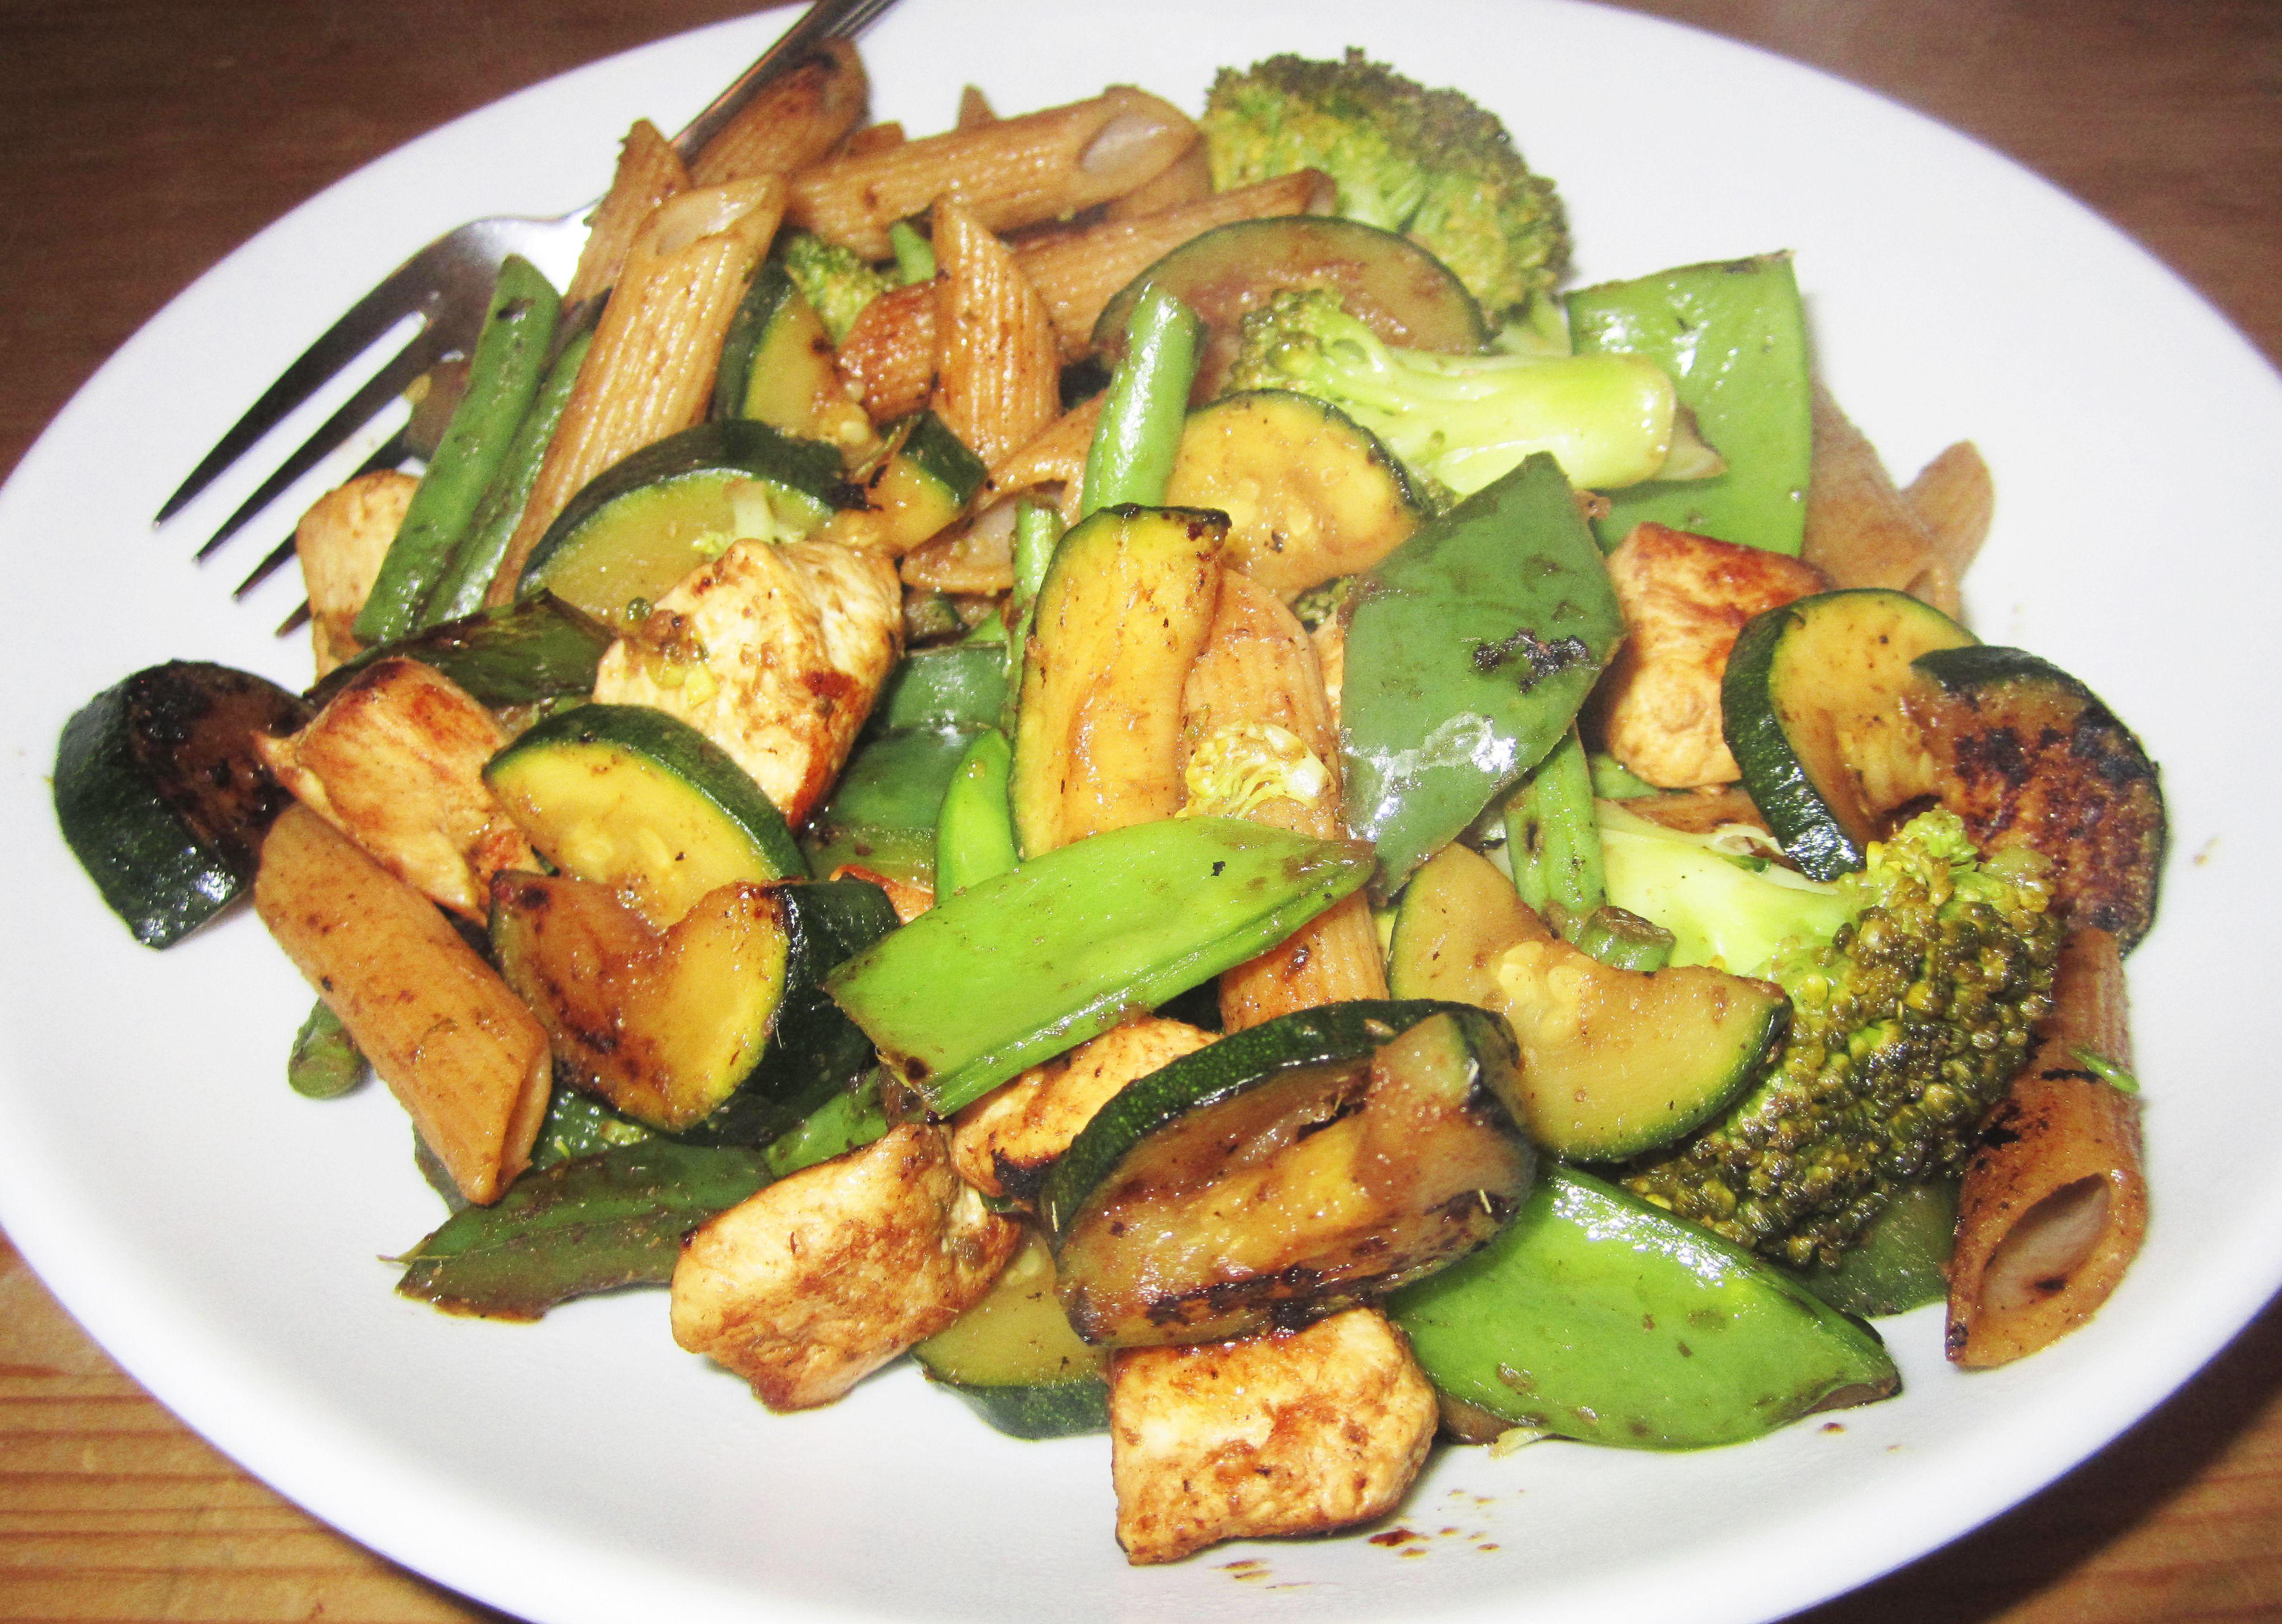 Healthy Easy Dinner  Quick chicken dinner recipes healthy Food chicken recipes